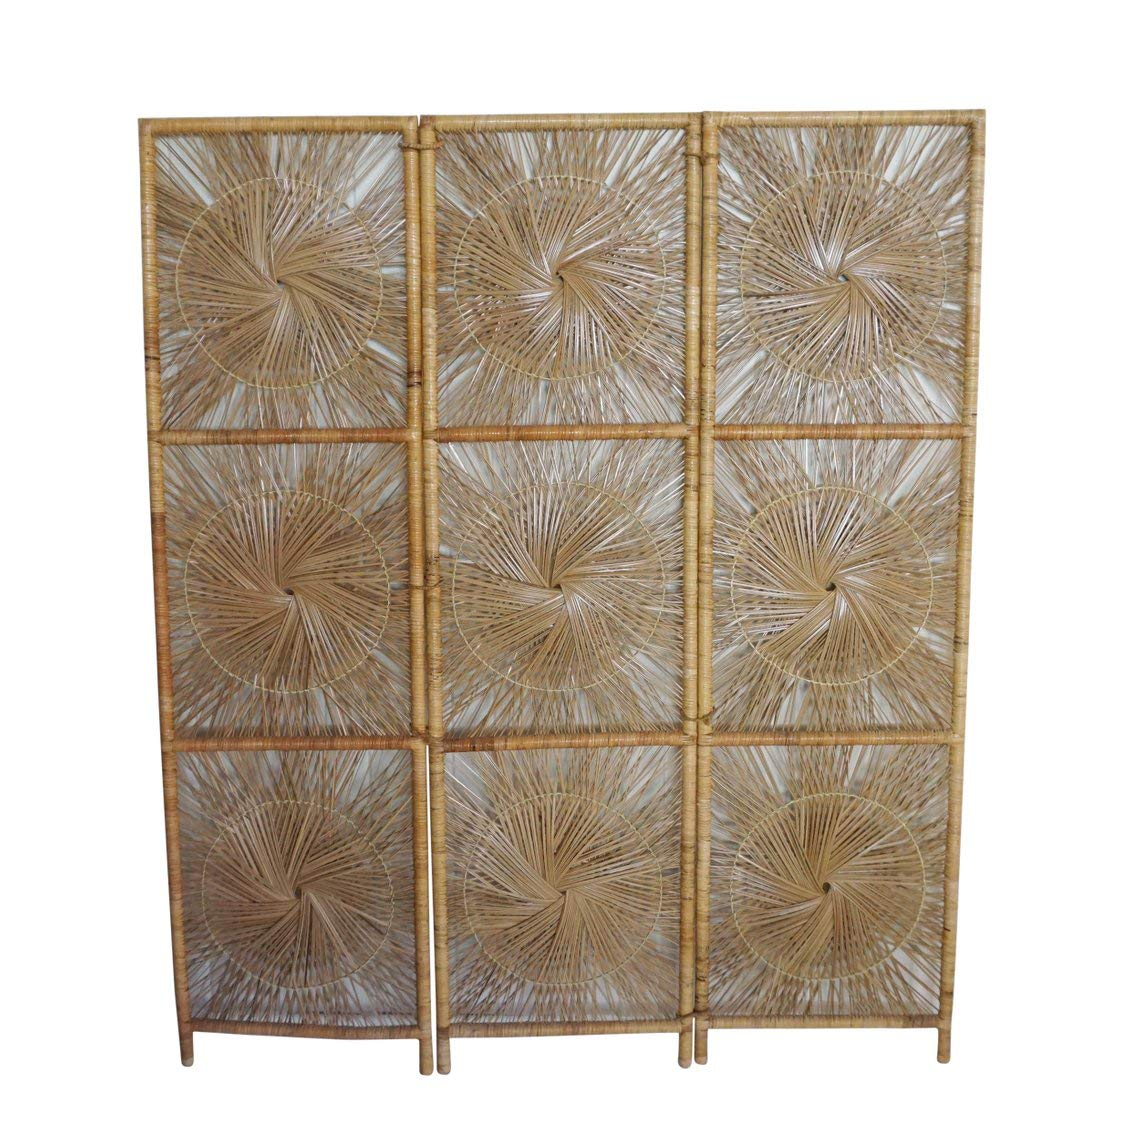 a0e1cdfc12069 Amazon.com - rattan sunburst Vintage Bohemian Wicker Folding Screen 3 Panel  Room Divider